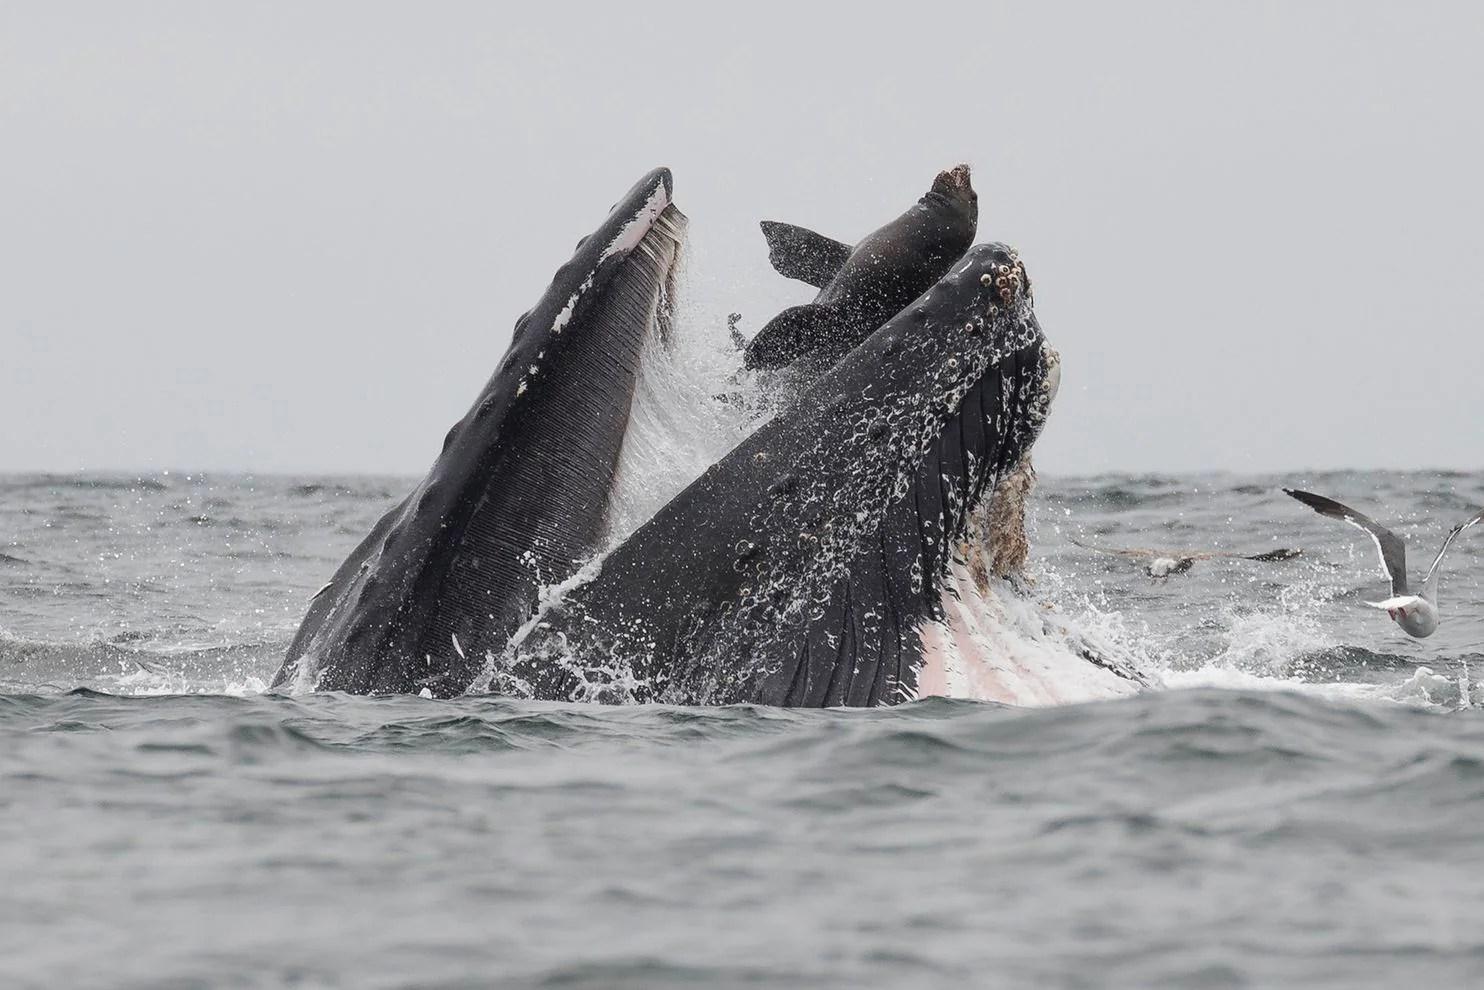 rare photo captures humpback